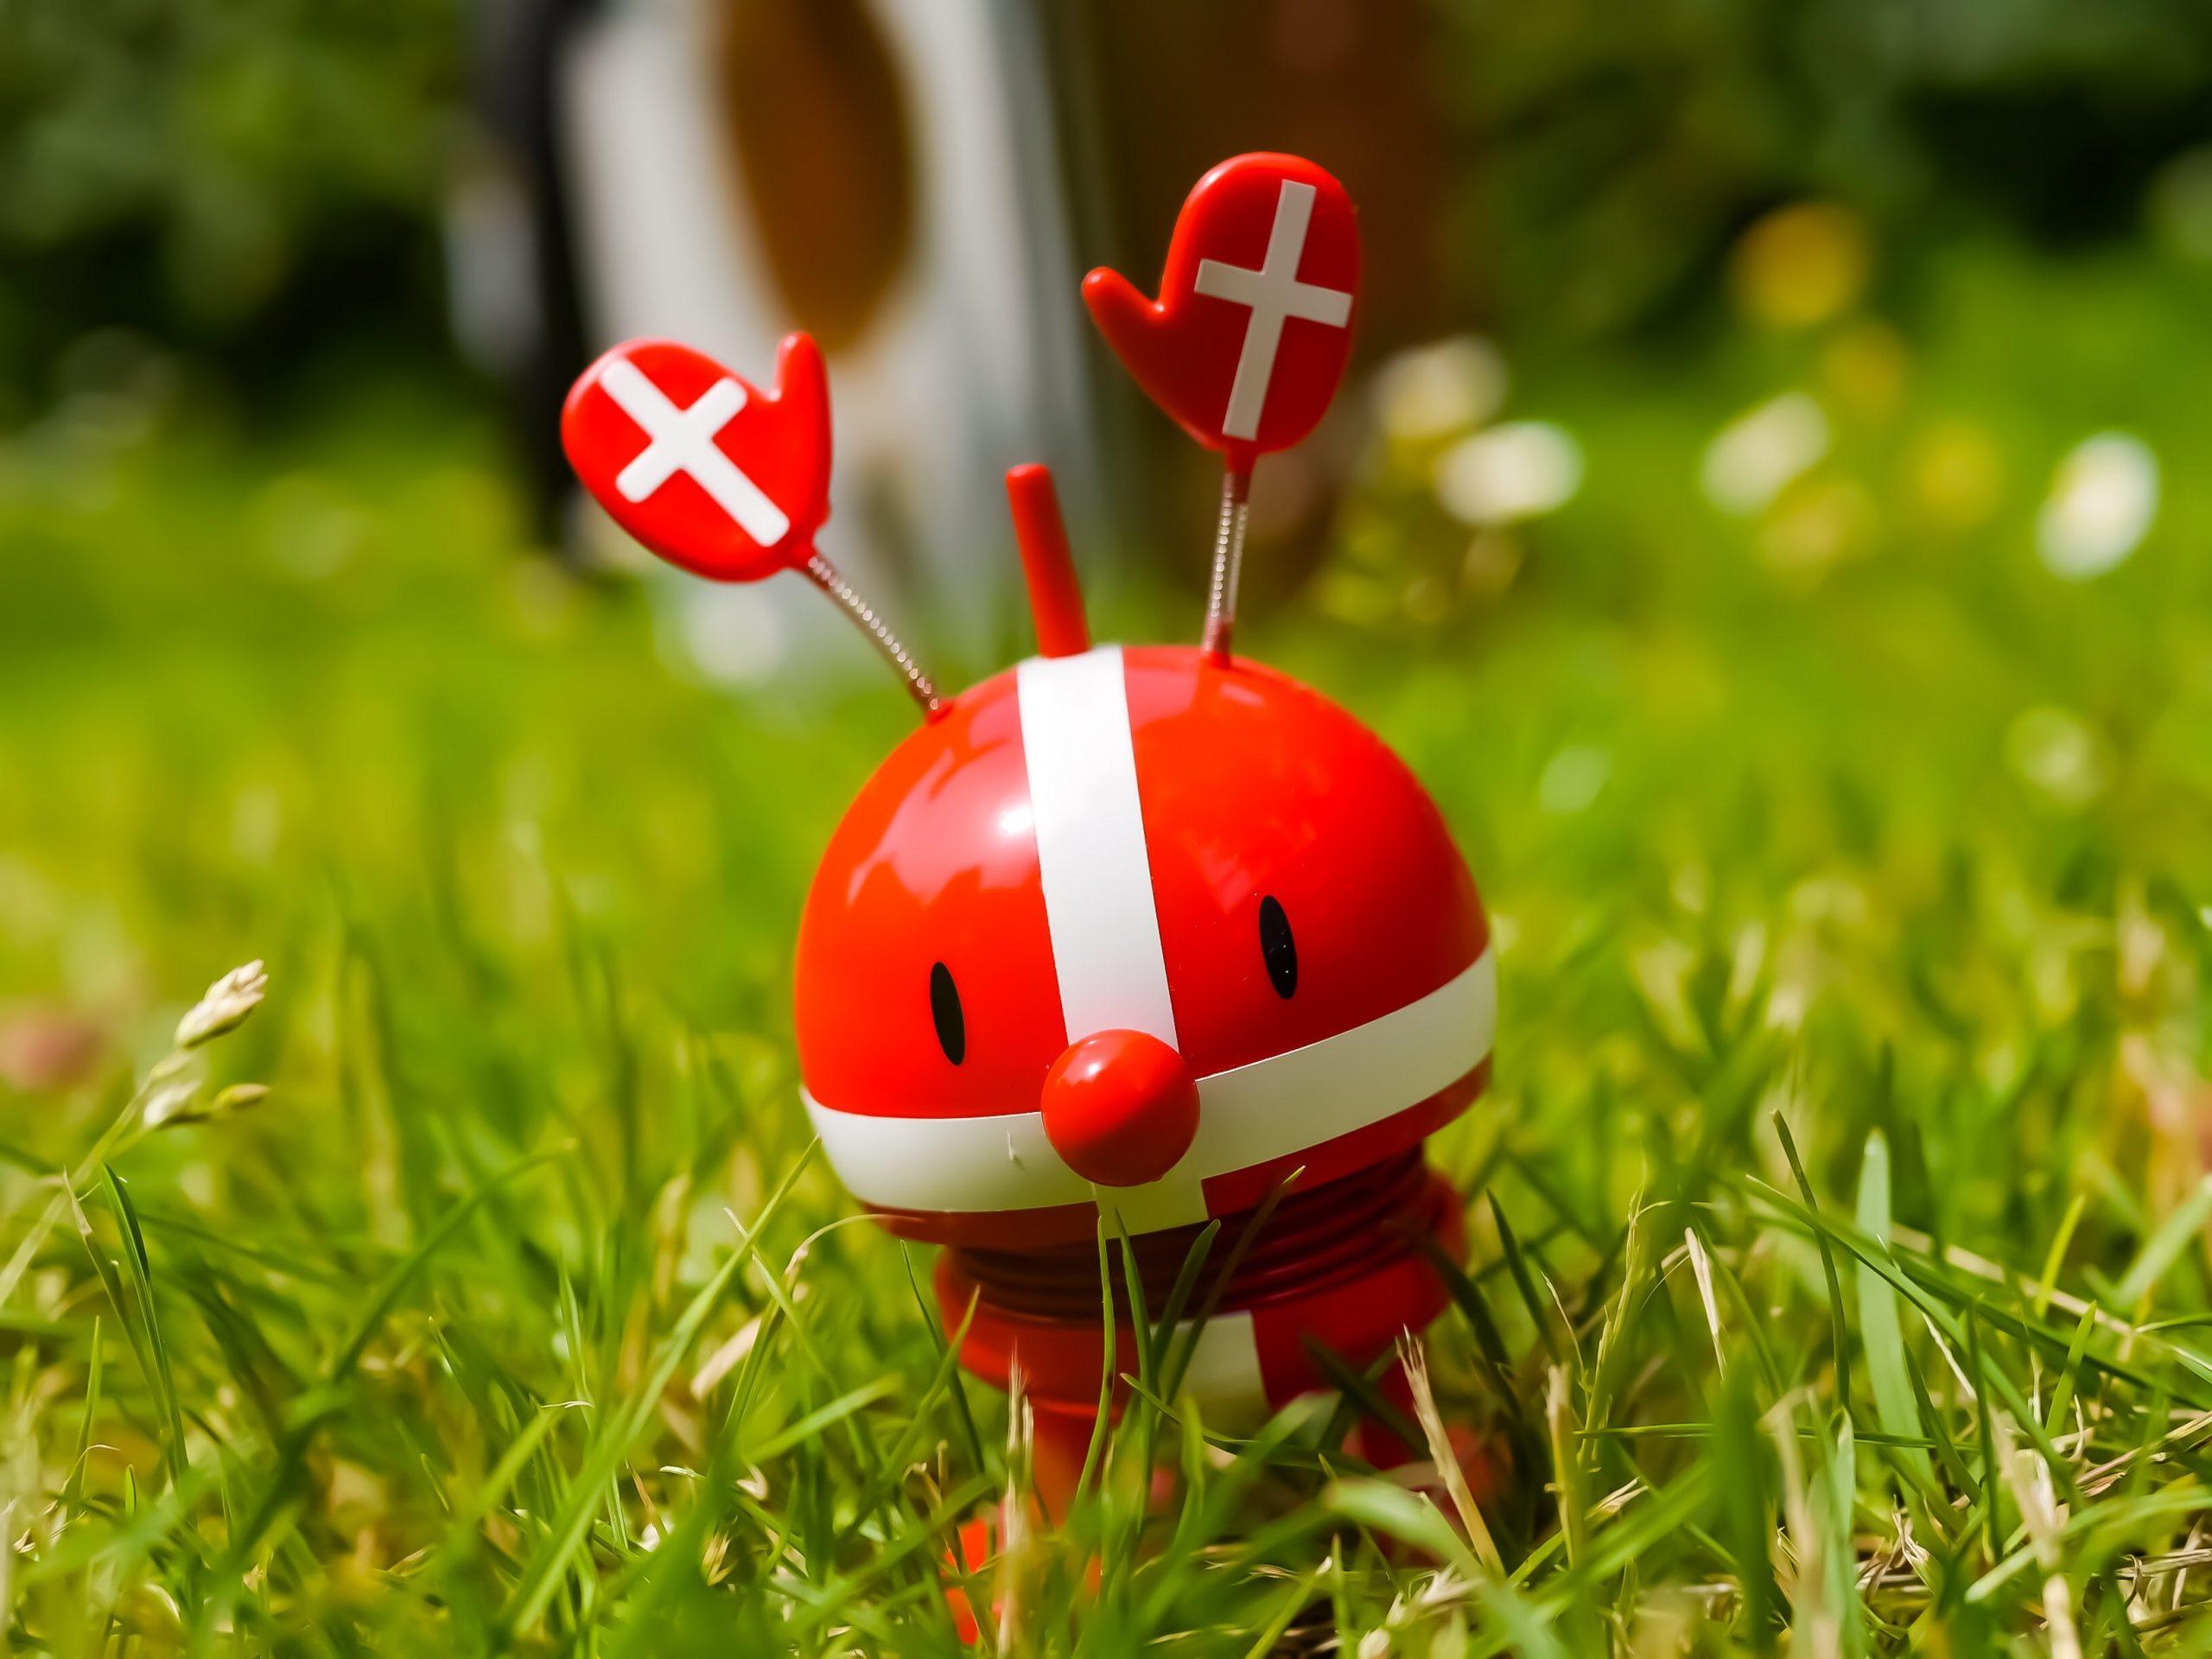 dansk danmark flag (Foto: Unsplash)